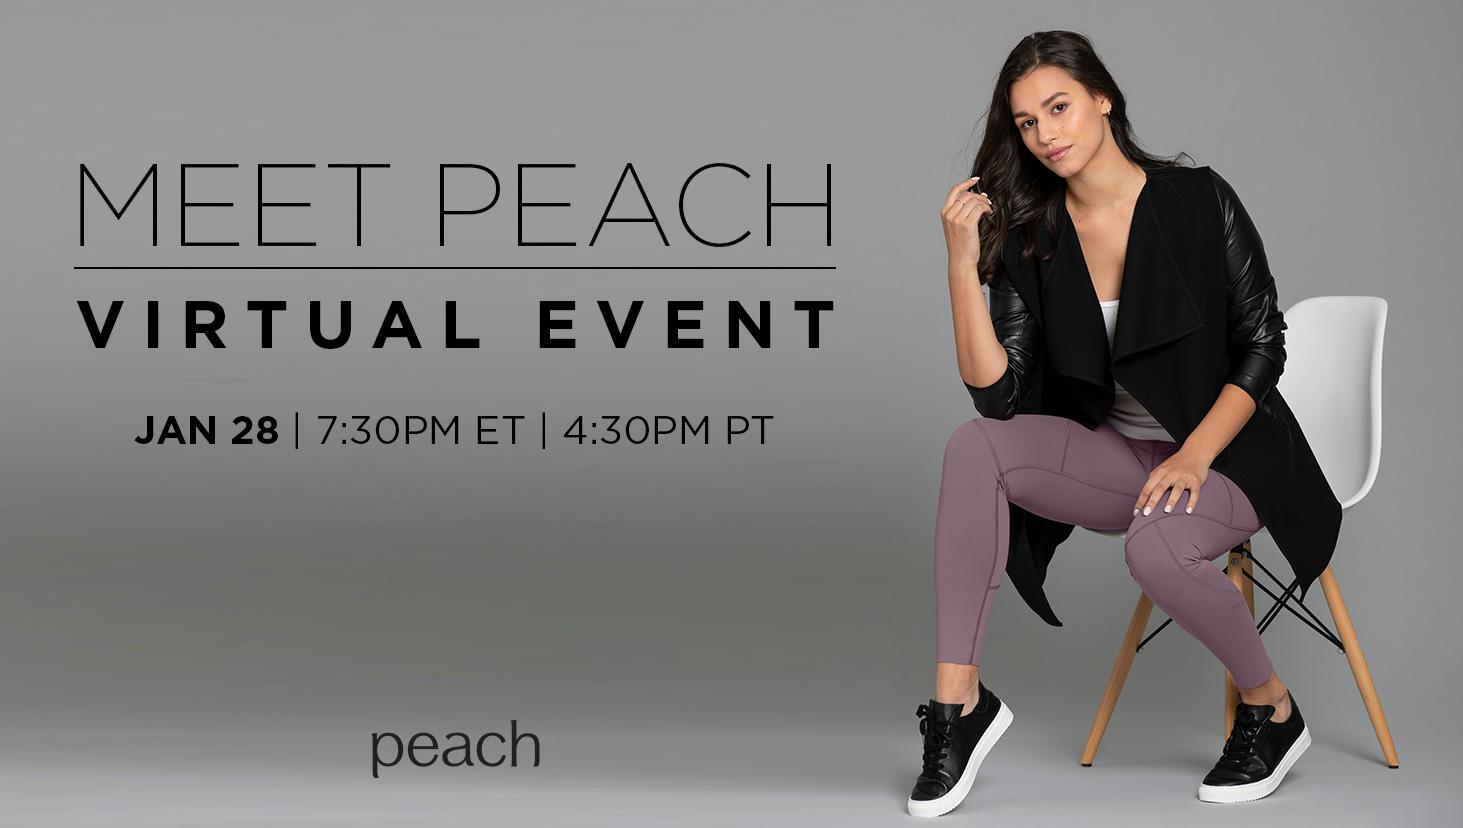 Event images meet peach